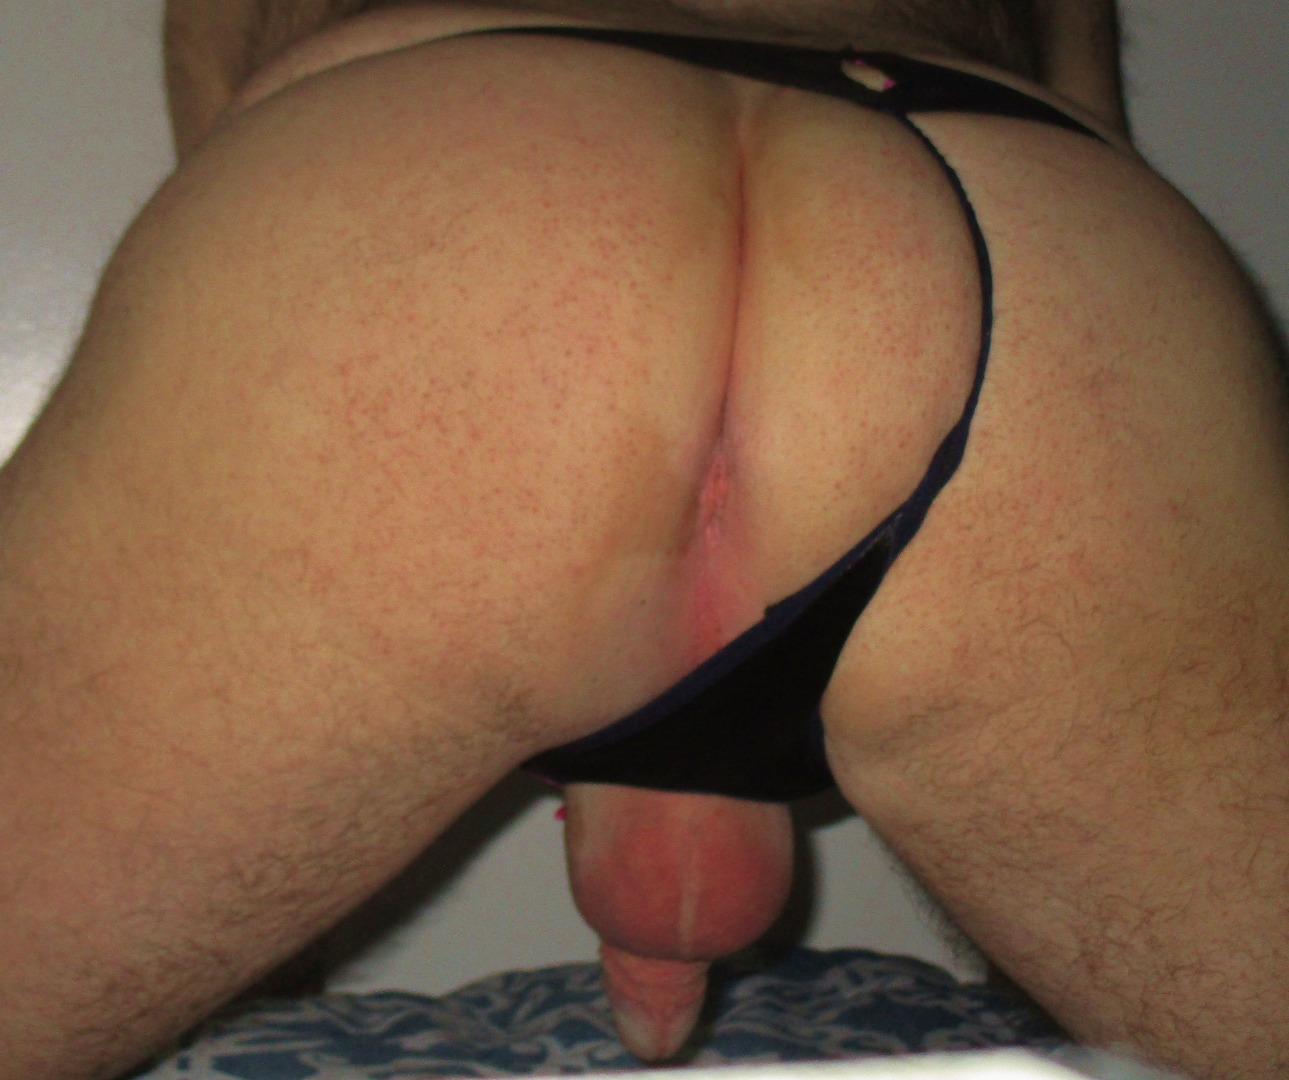 vaj anal erection kinky jo sasha star alien GAY, Amateur, Bisexual, Cd, Closeup, Cock, Crossdressing, Dick, Shavedcock, Sissy